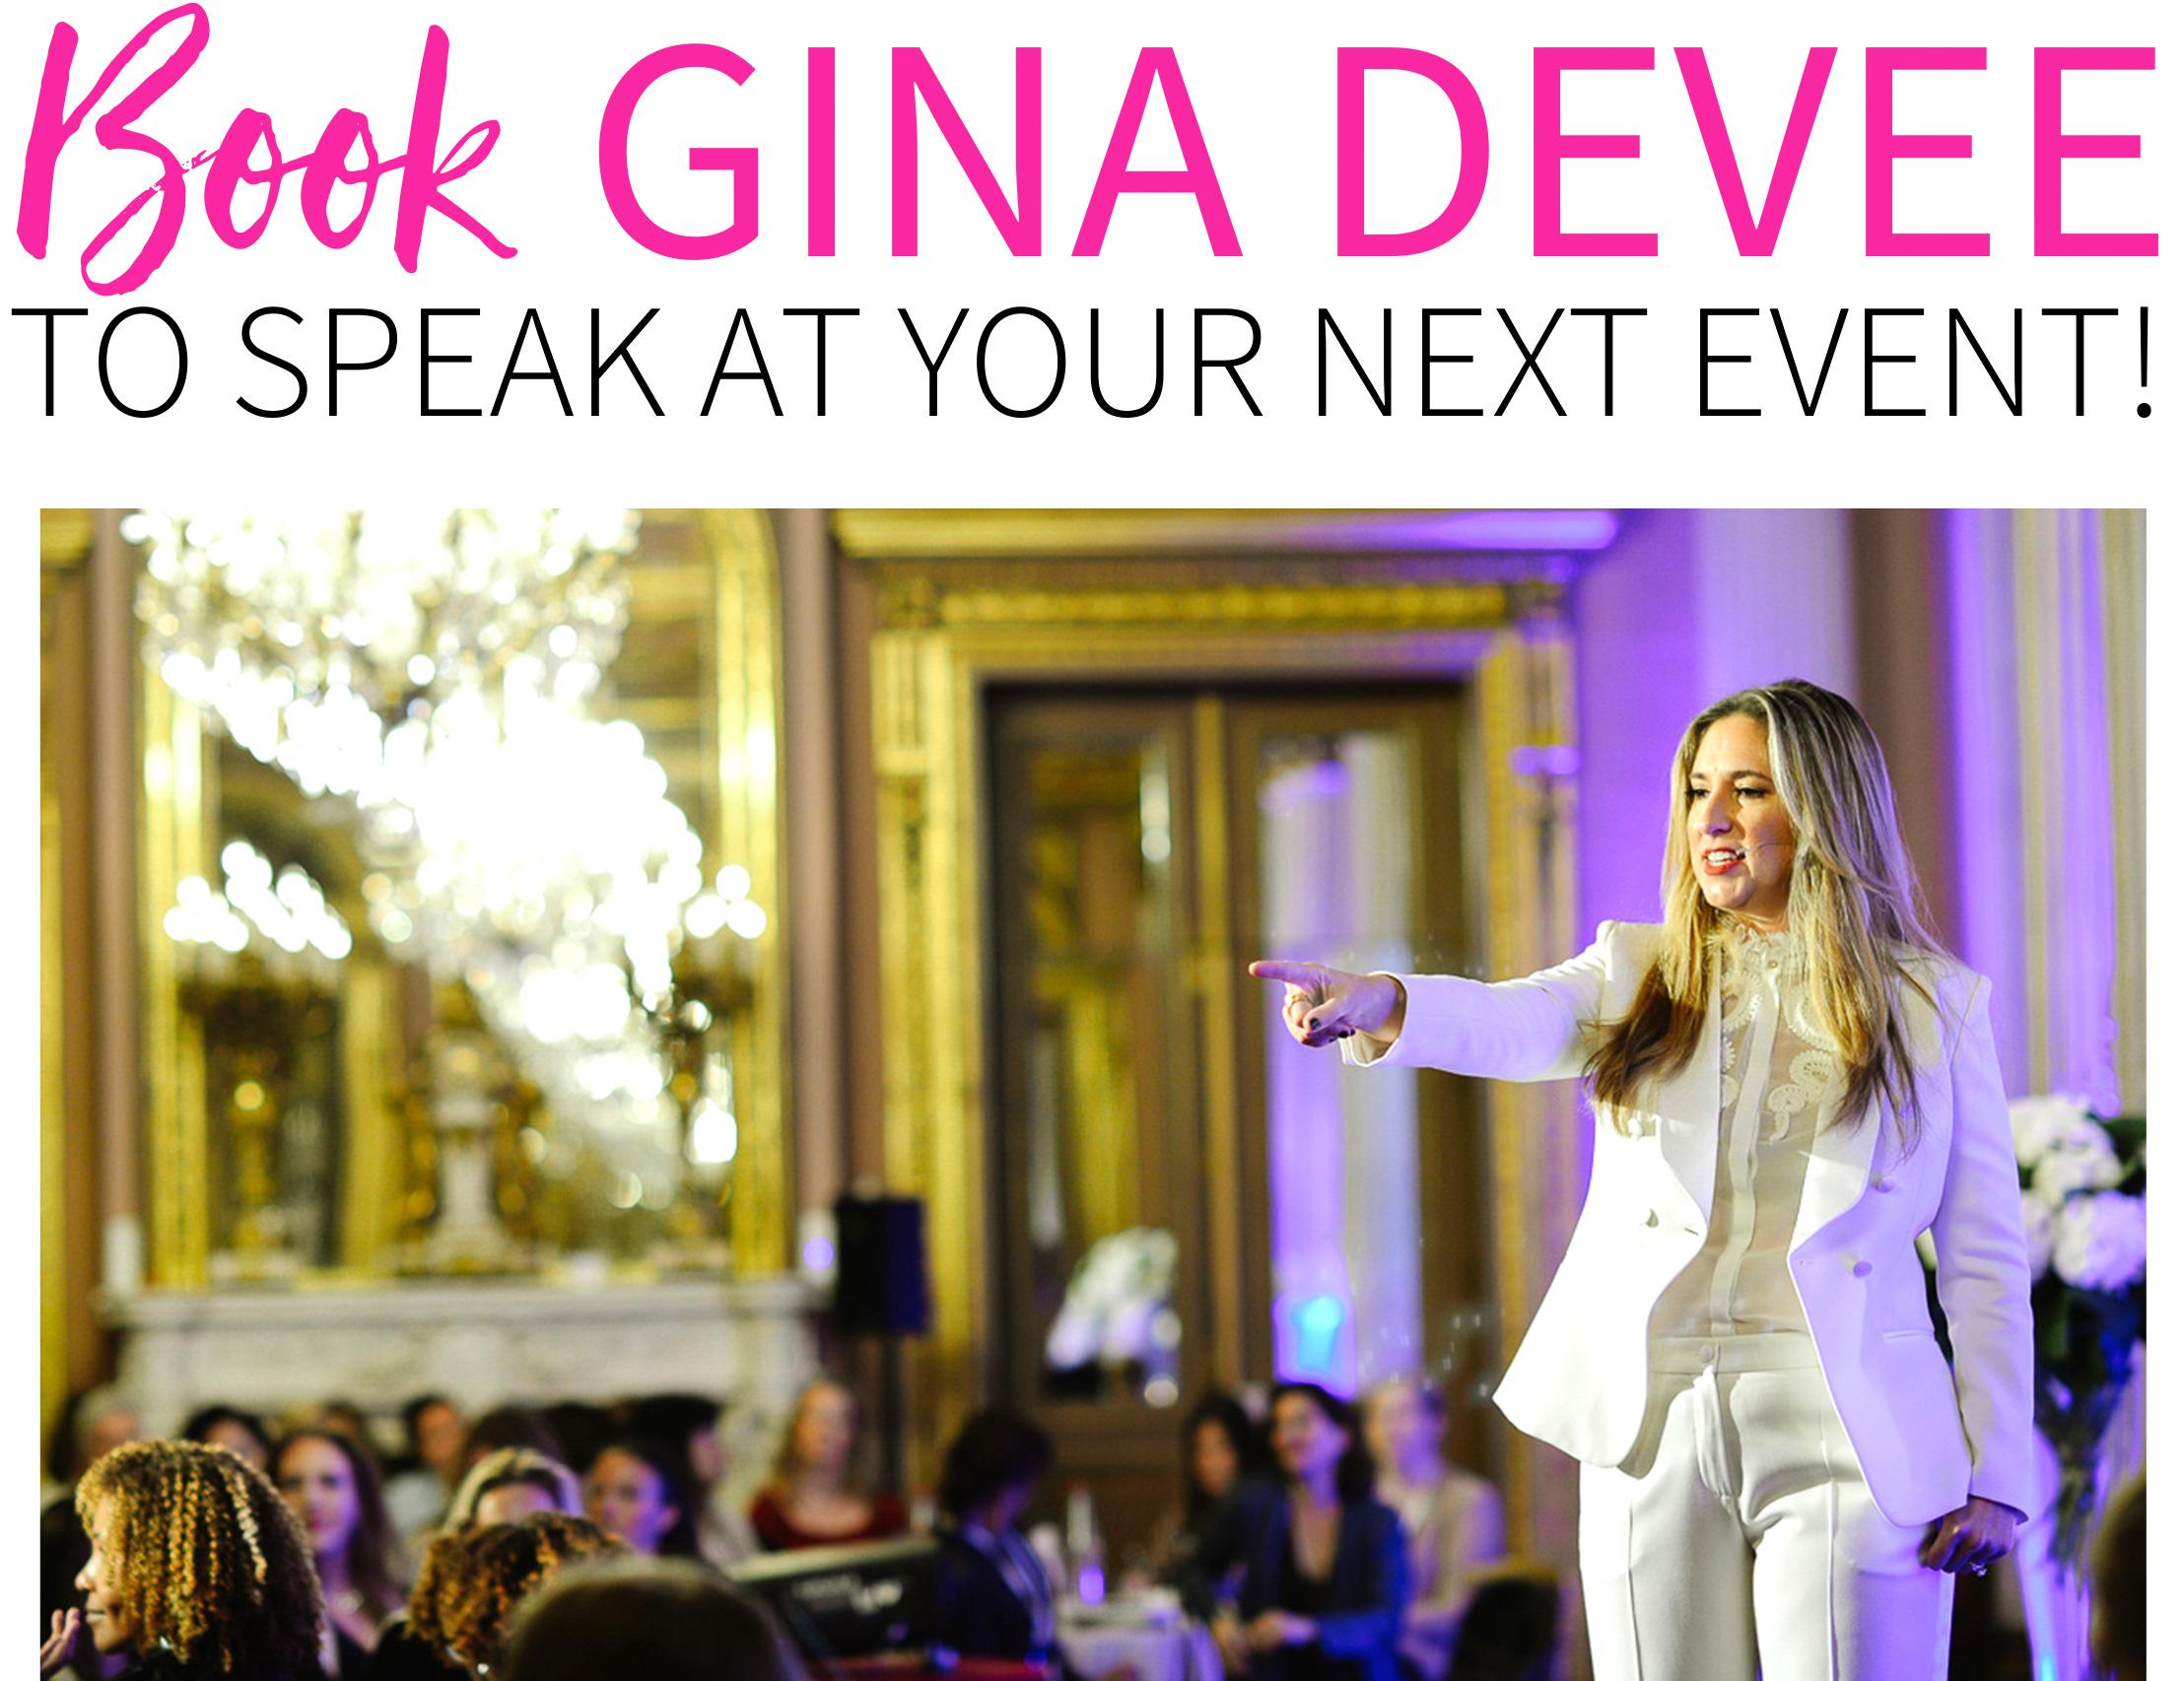 Gina DeVee - Speaker